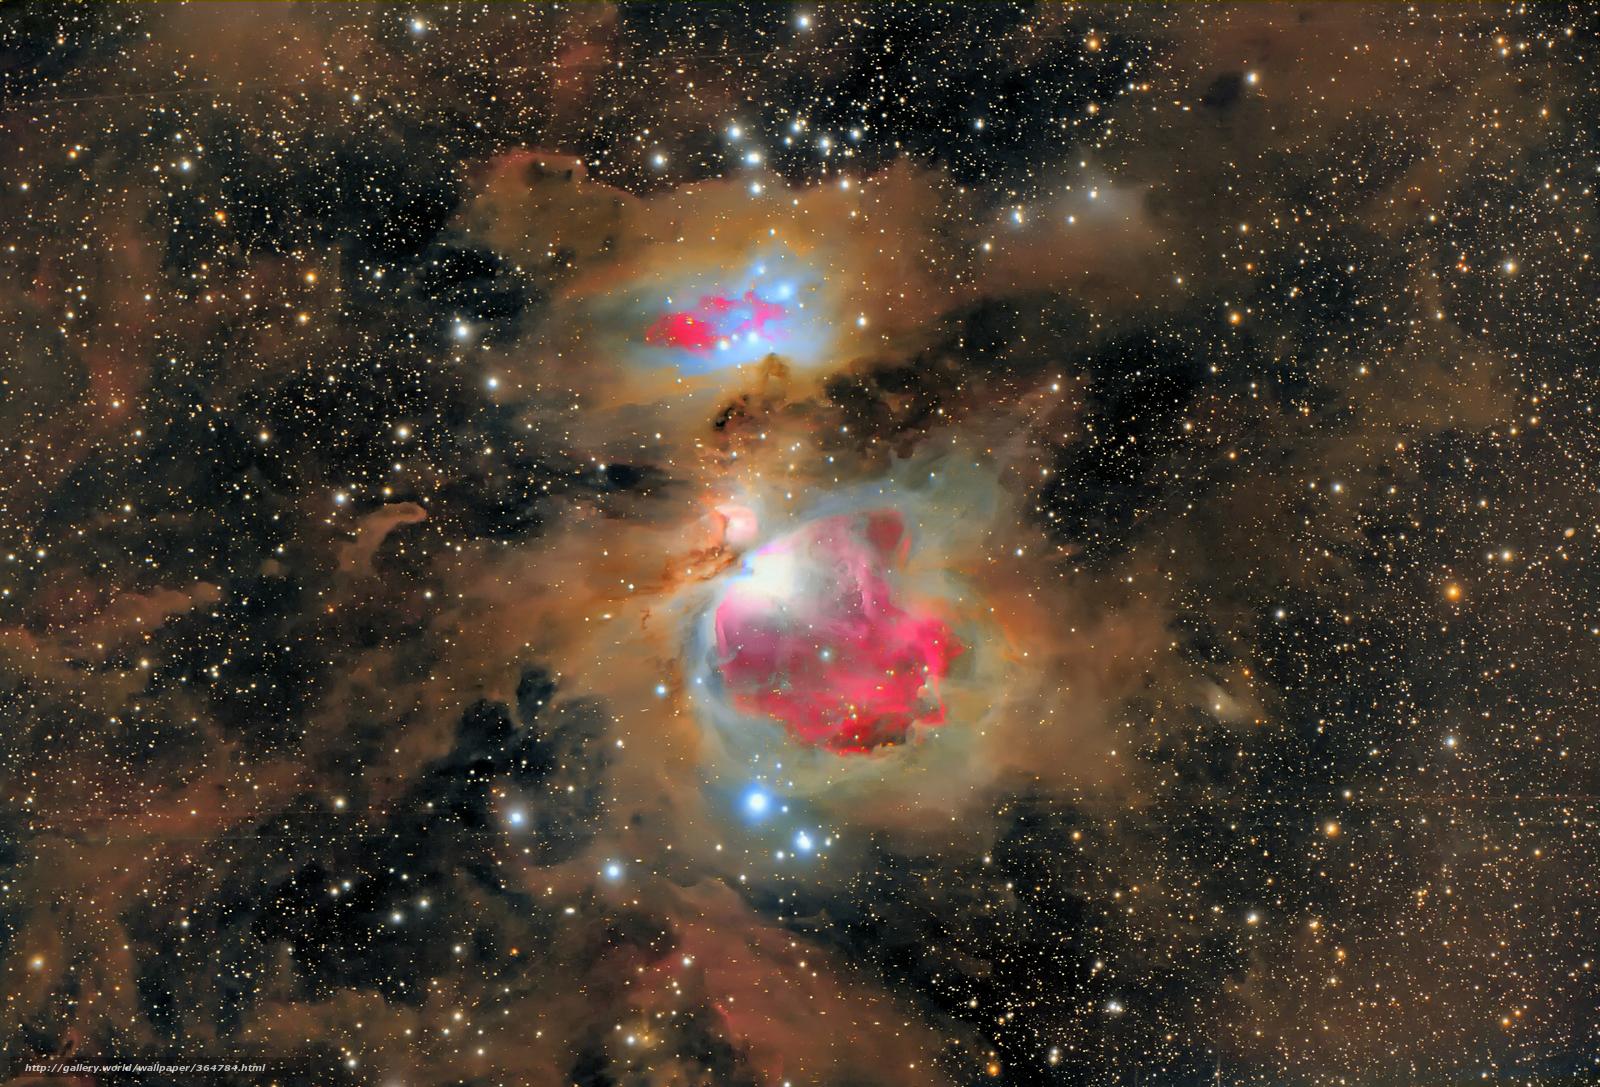 wallpaper Orion constellation nebula dust desktop wallpaper 1600x1087